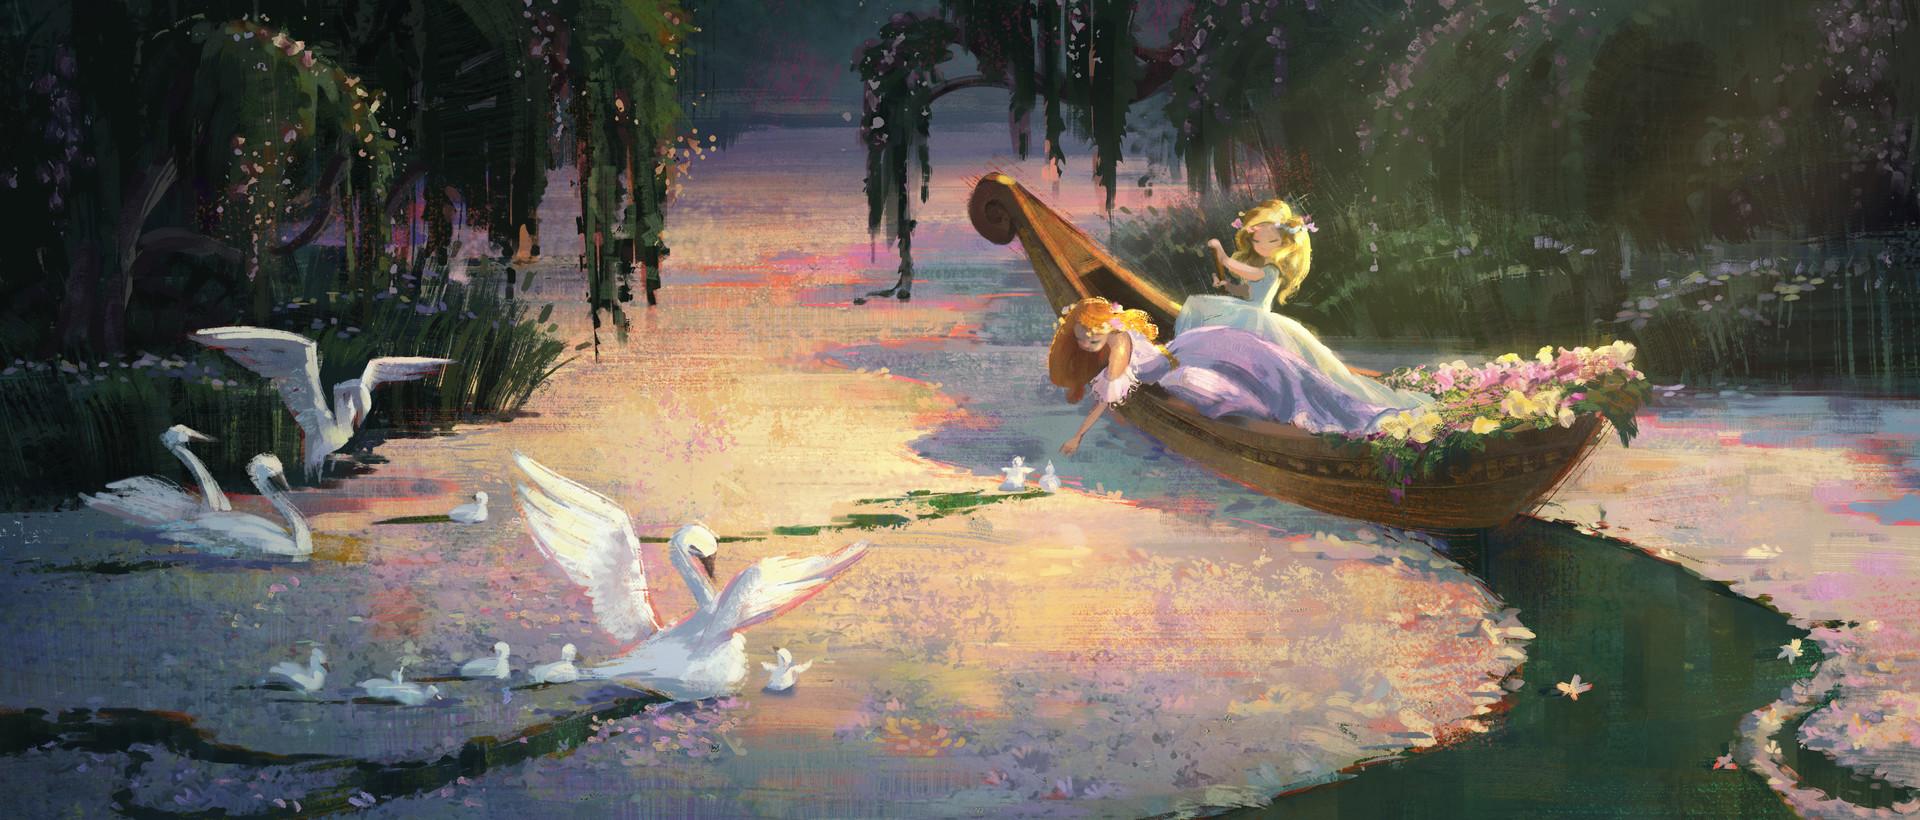 Фото Две девушки в лодке на озере, усыпанном цветами, в котором плавают лебеди со своими птенцами, by Cathleen McAllister